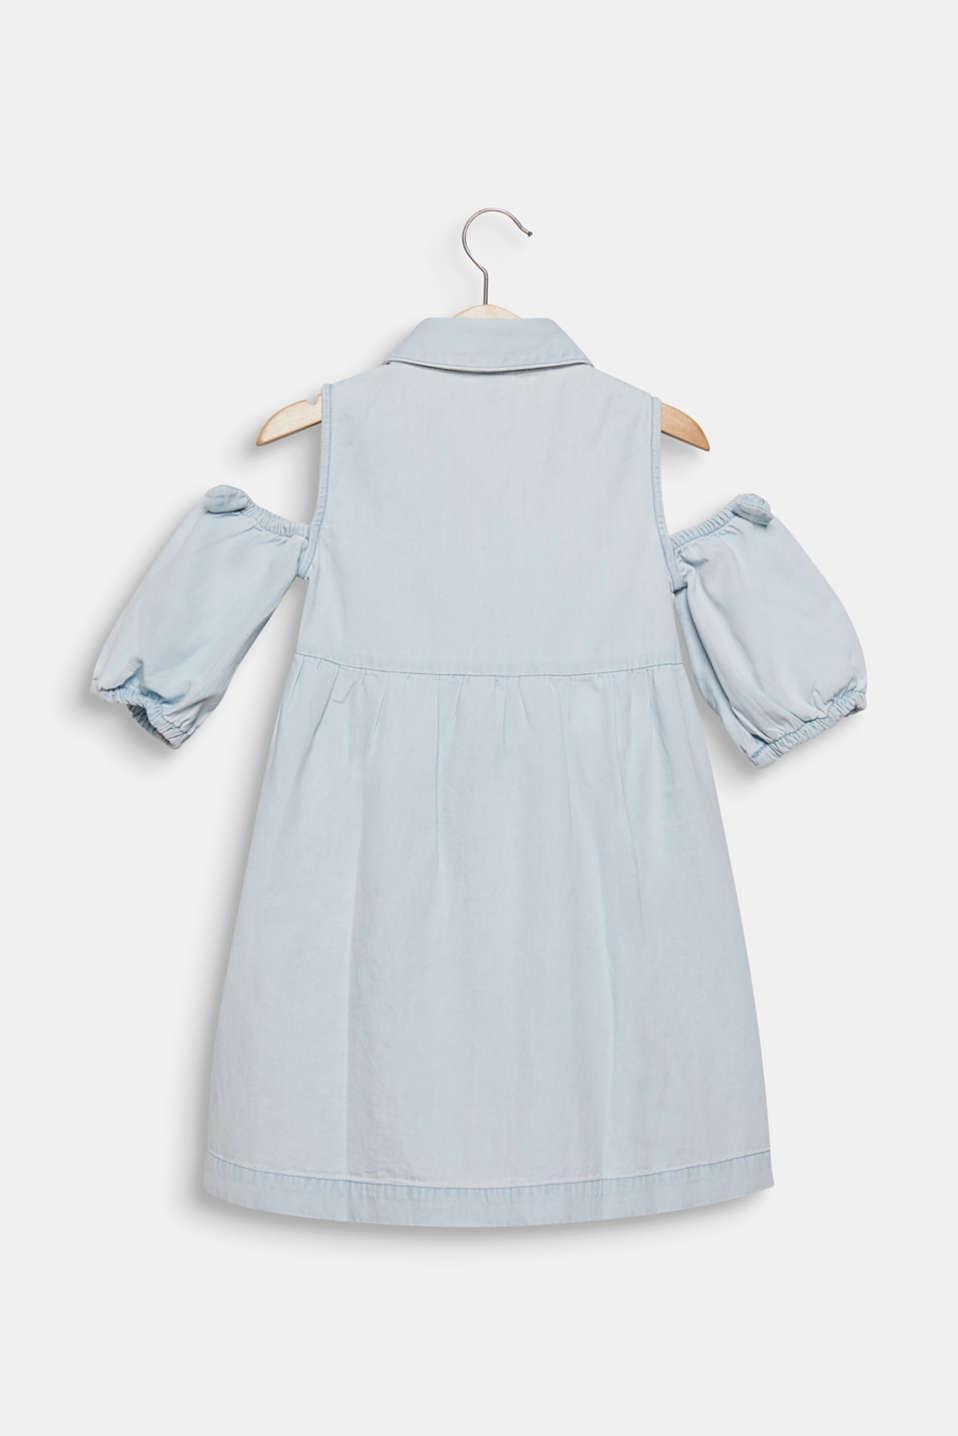 Denim dress with cut-out shoulders, cotton, LIGHT INDIGO D, detail image number 1